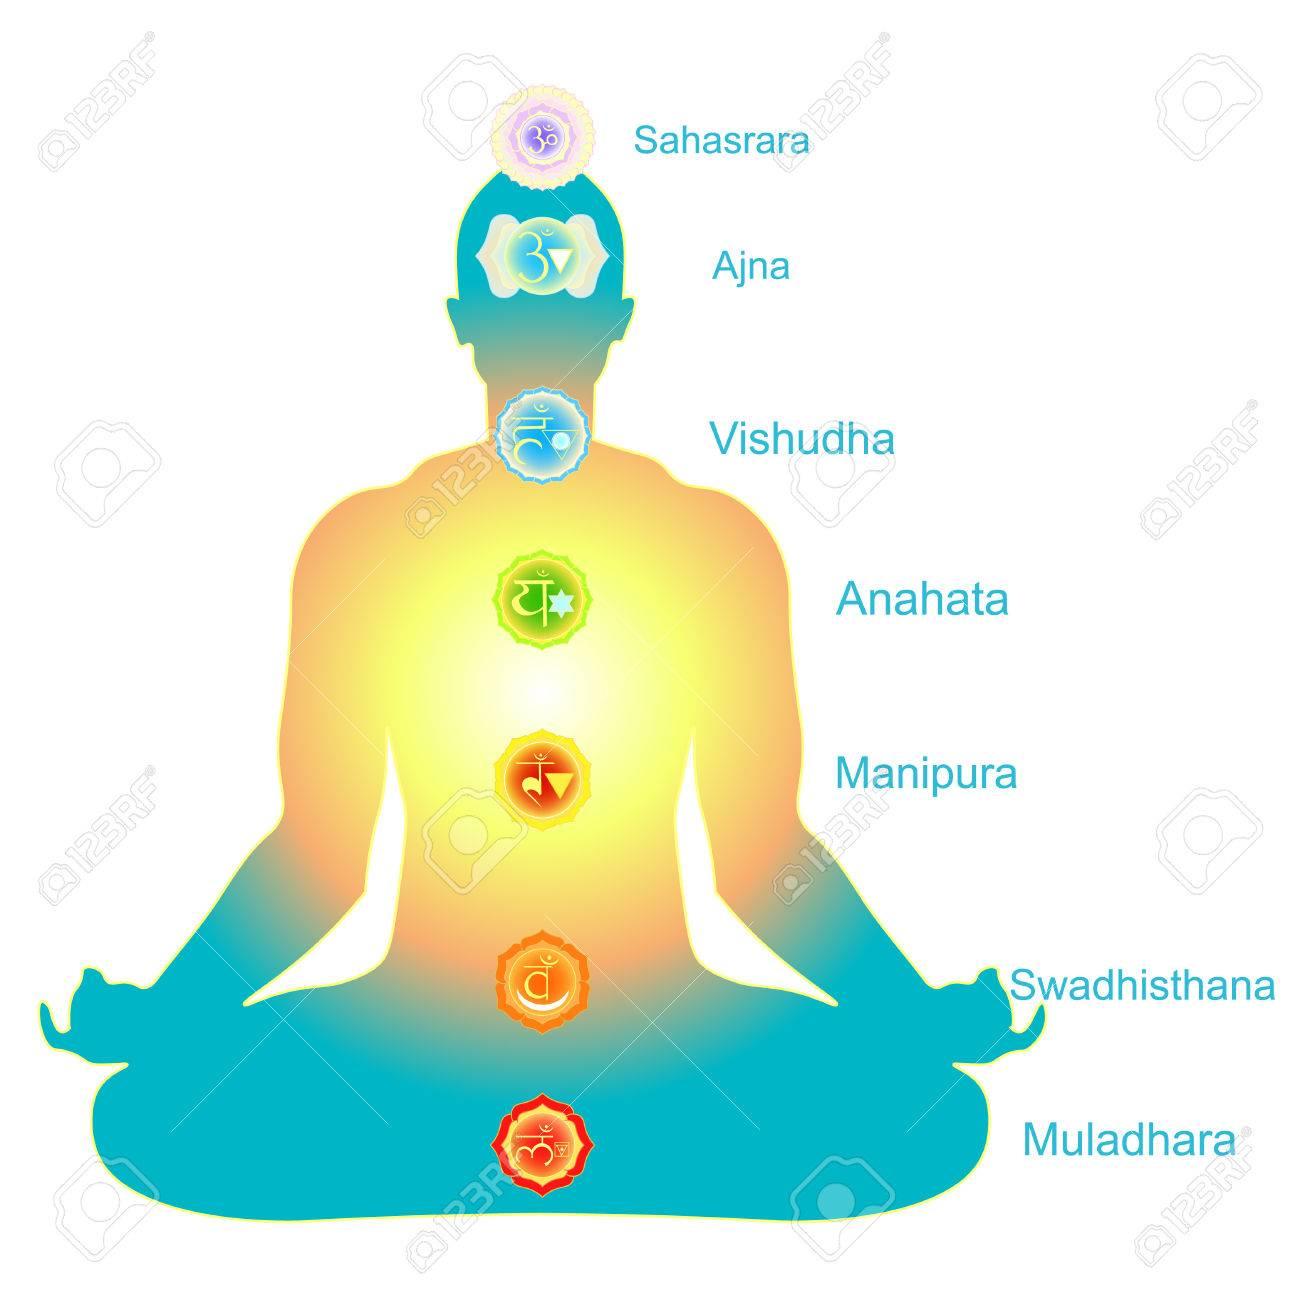 Meditation Yoga Man With Chakras Vector Illustration Royalty Free Cliparts Vectors And Stock Illustration Image 65967475